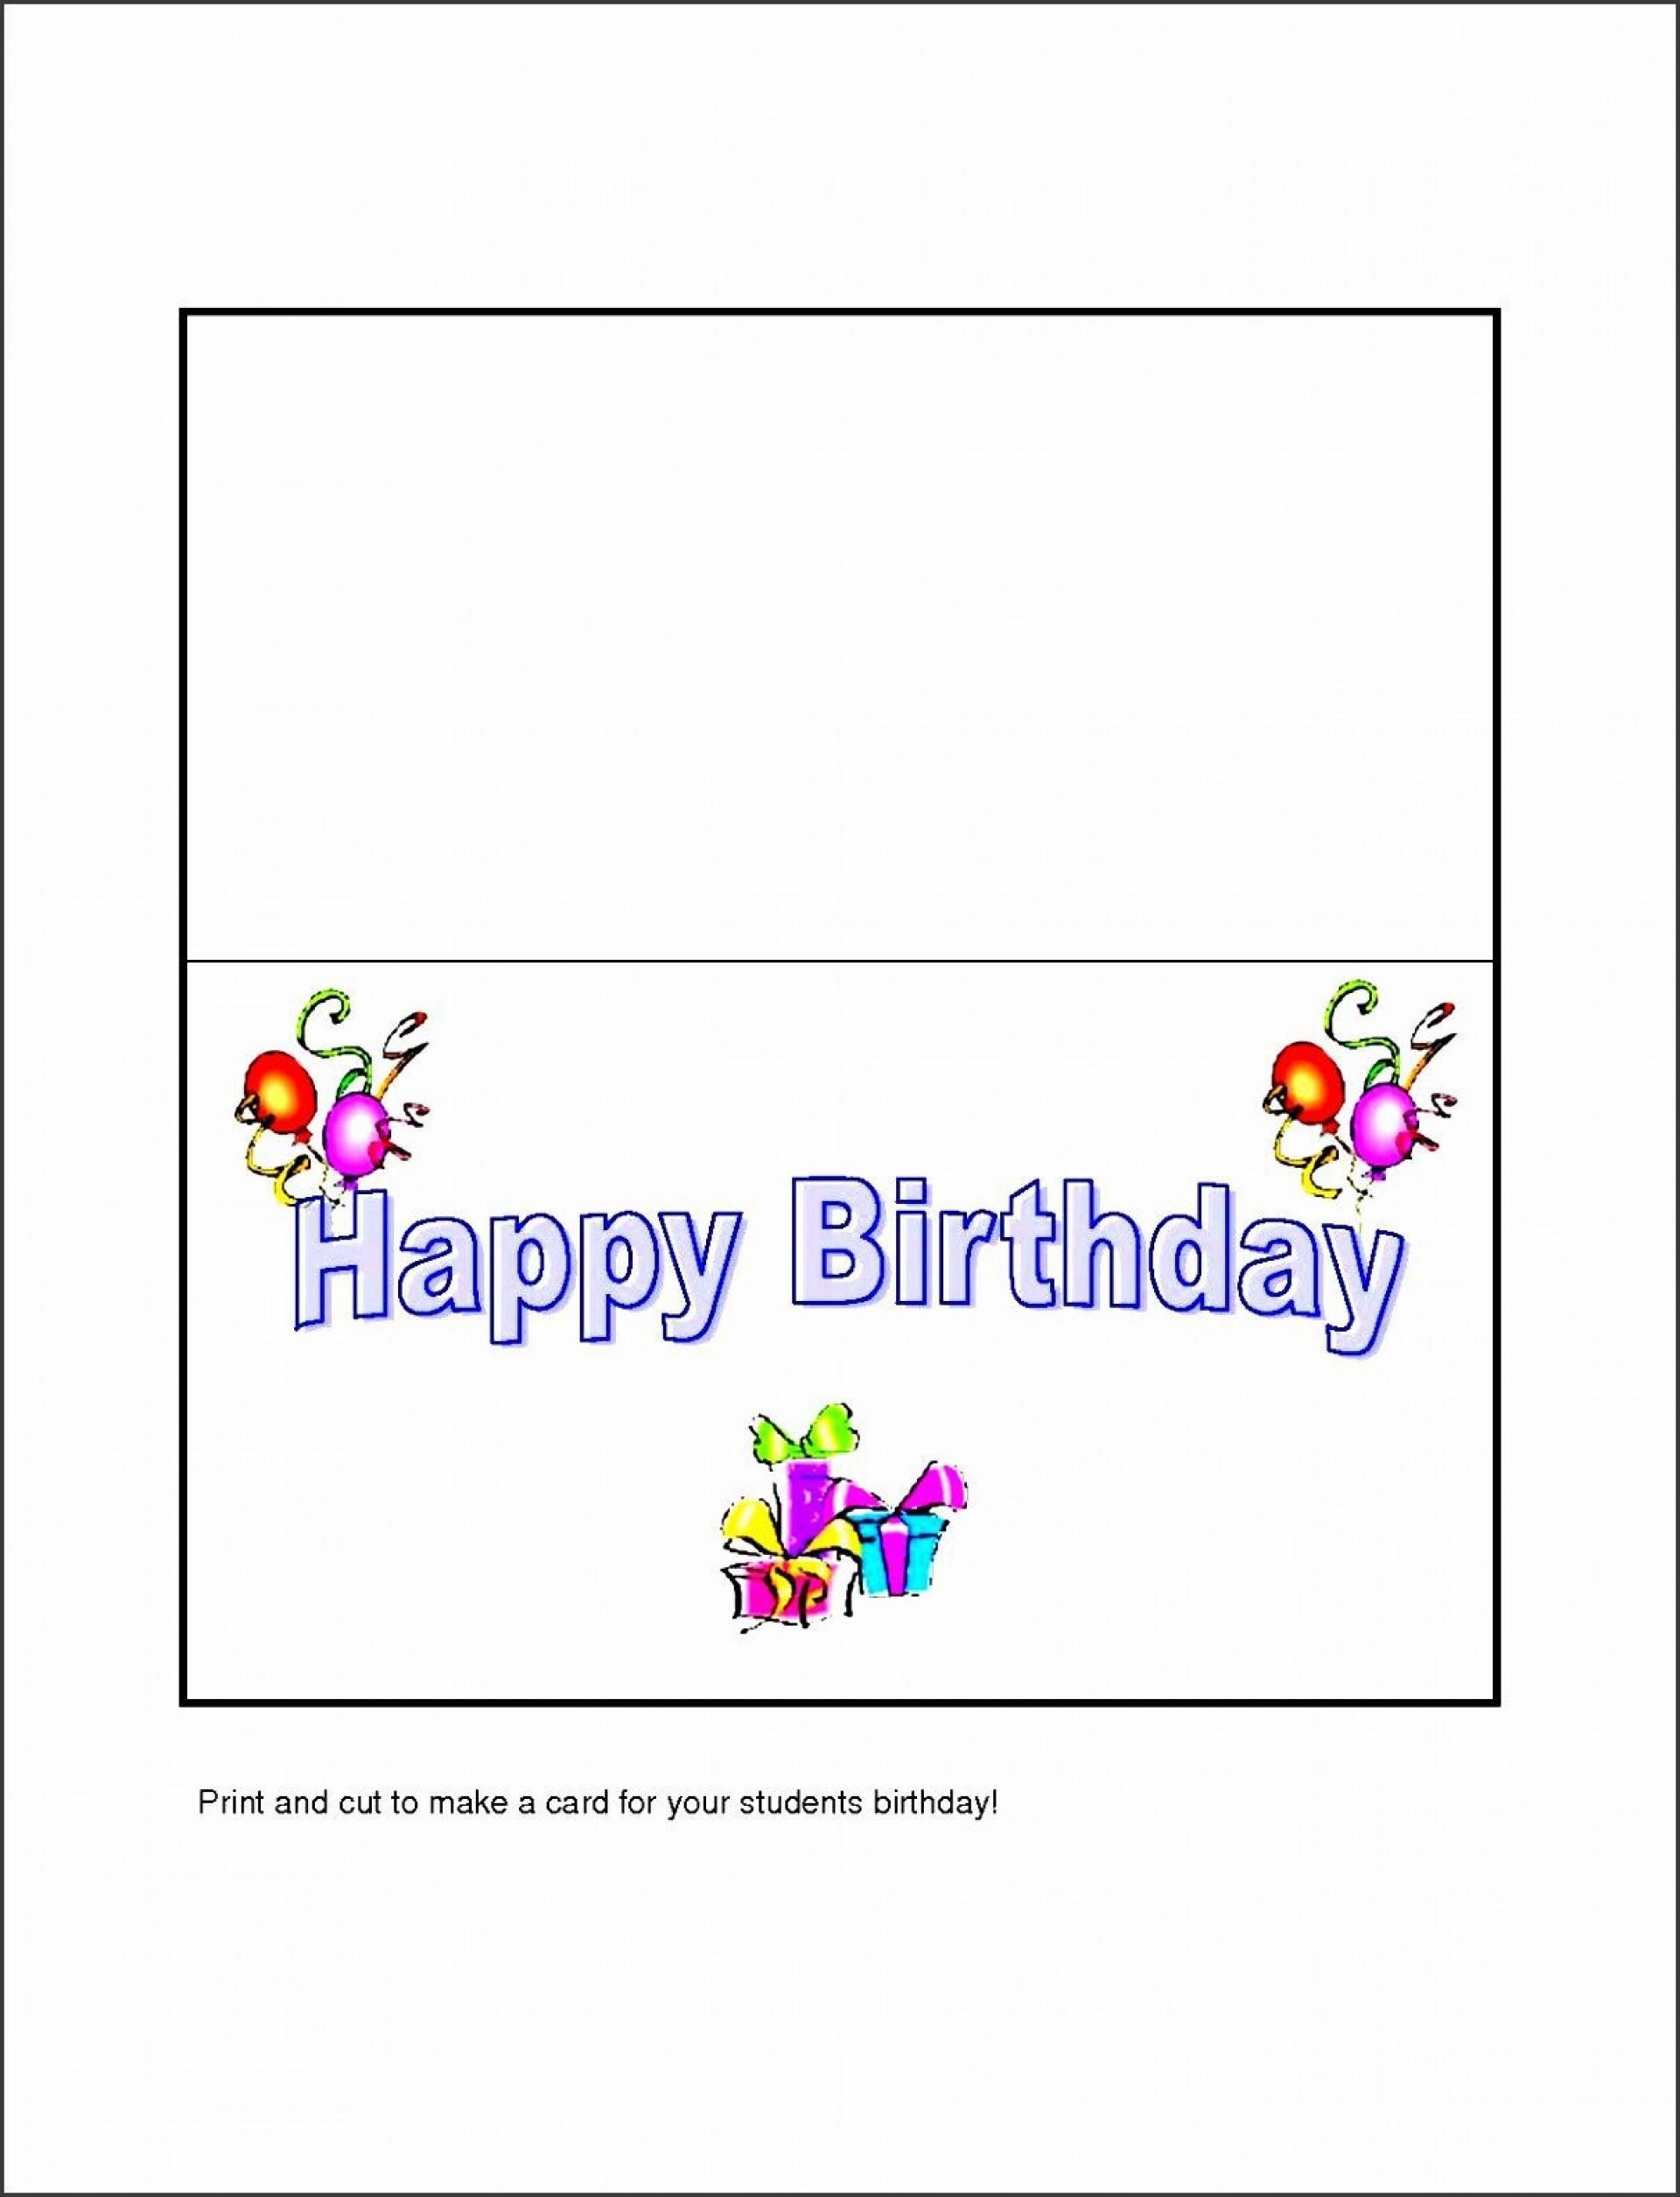 004 Singular Free Printable Card Template Word Idea  Blank Busines For1920